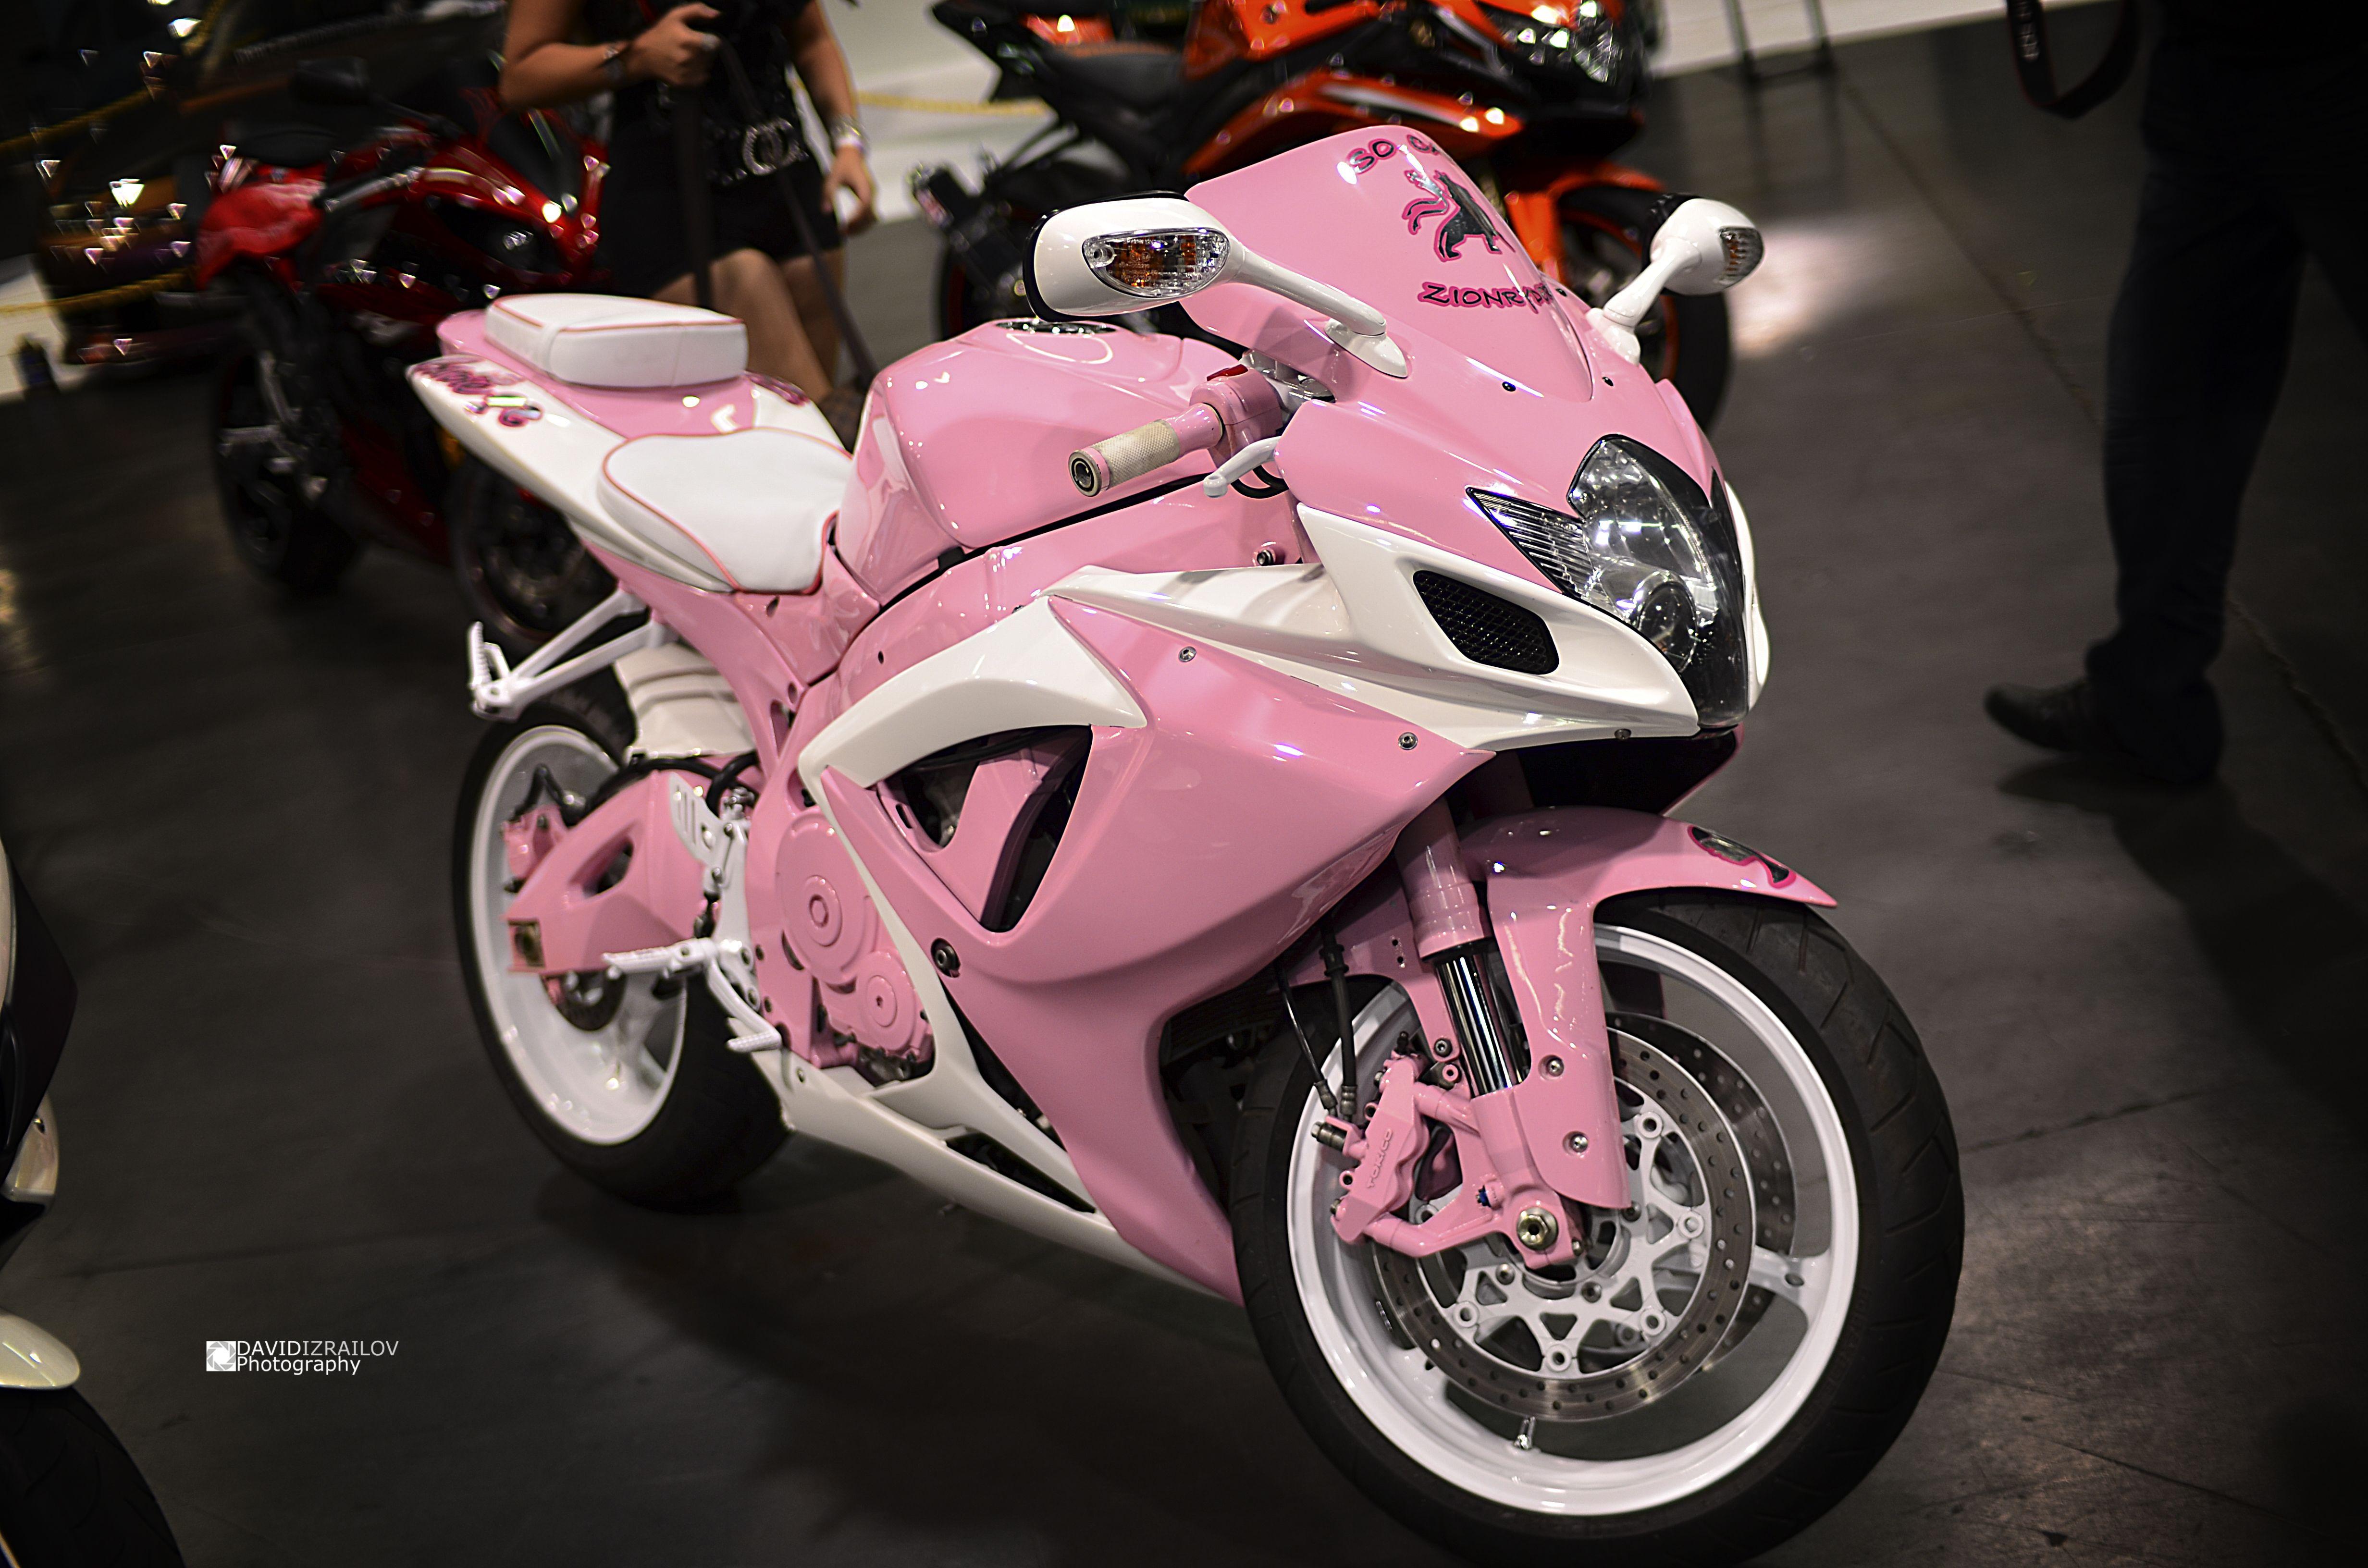 pink motorcycle motorcycles bike super bikes sport street custom girly flickriver pretty google think cars rosa ride gemerkt